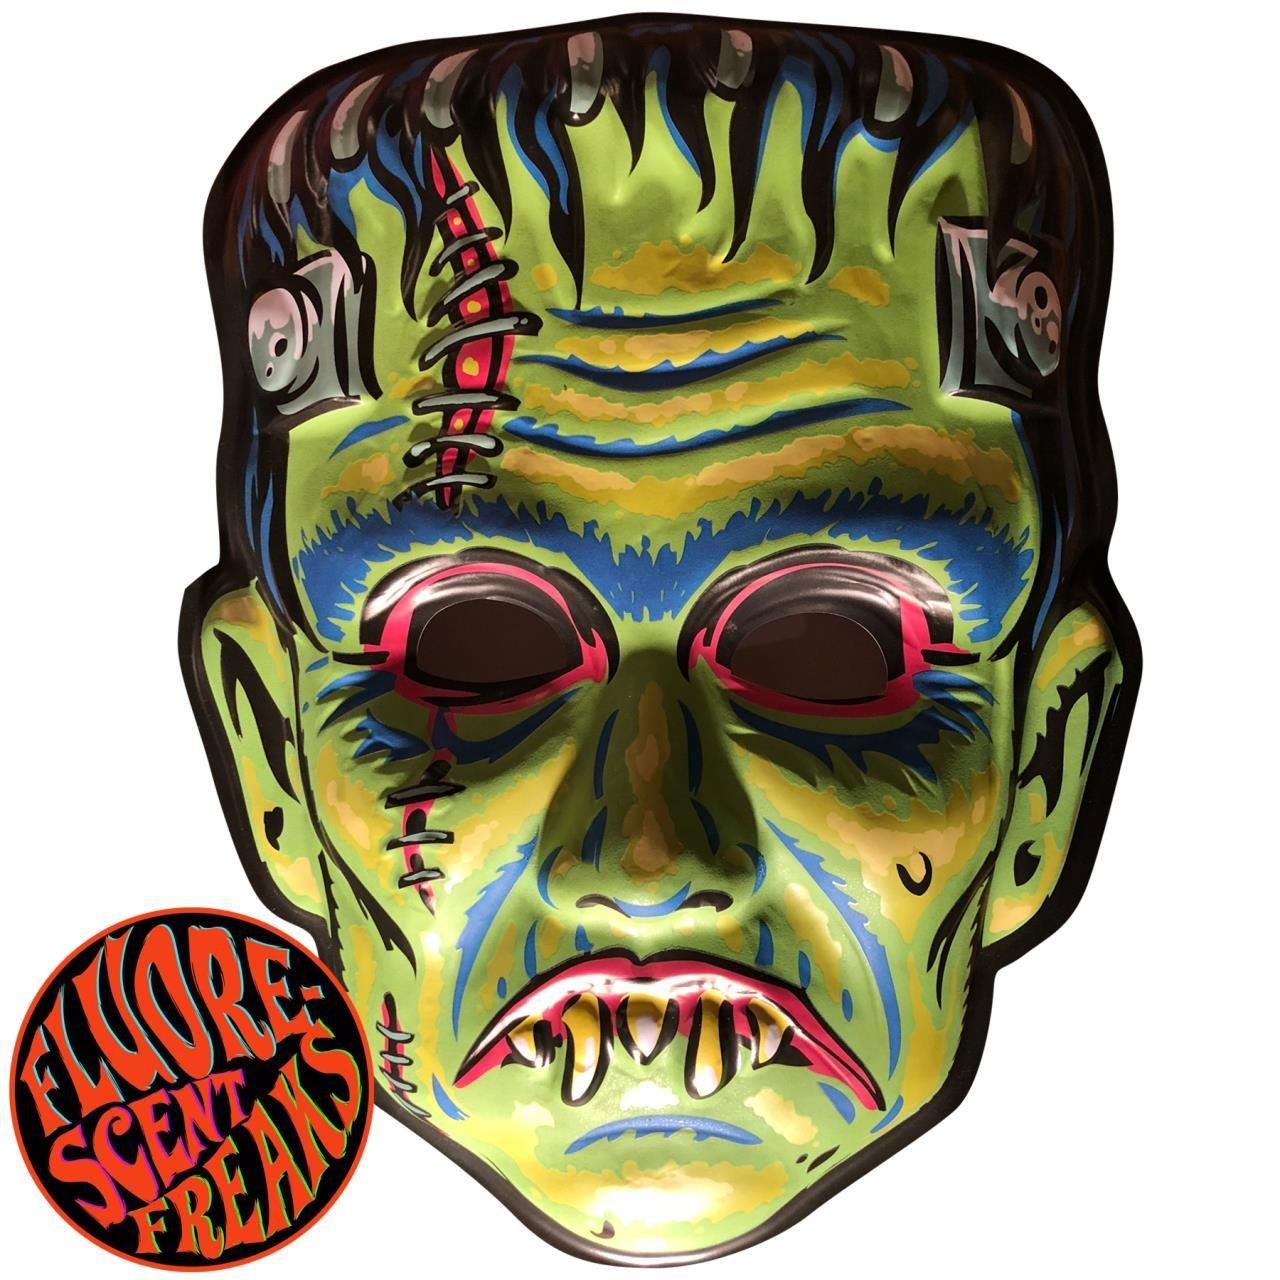 Retro-a-go-go! Son-of-Frankie Vac-Tastic Plastic Mask Wall Decor by Retro-a-go-go!